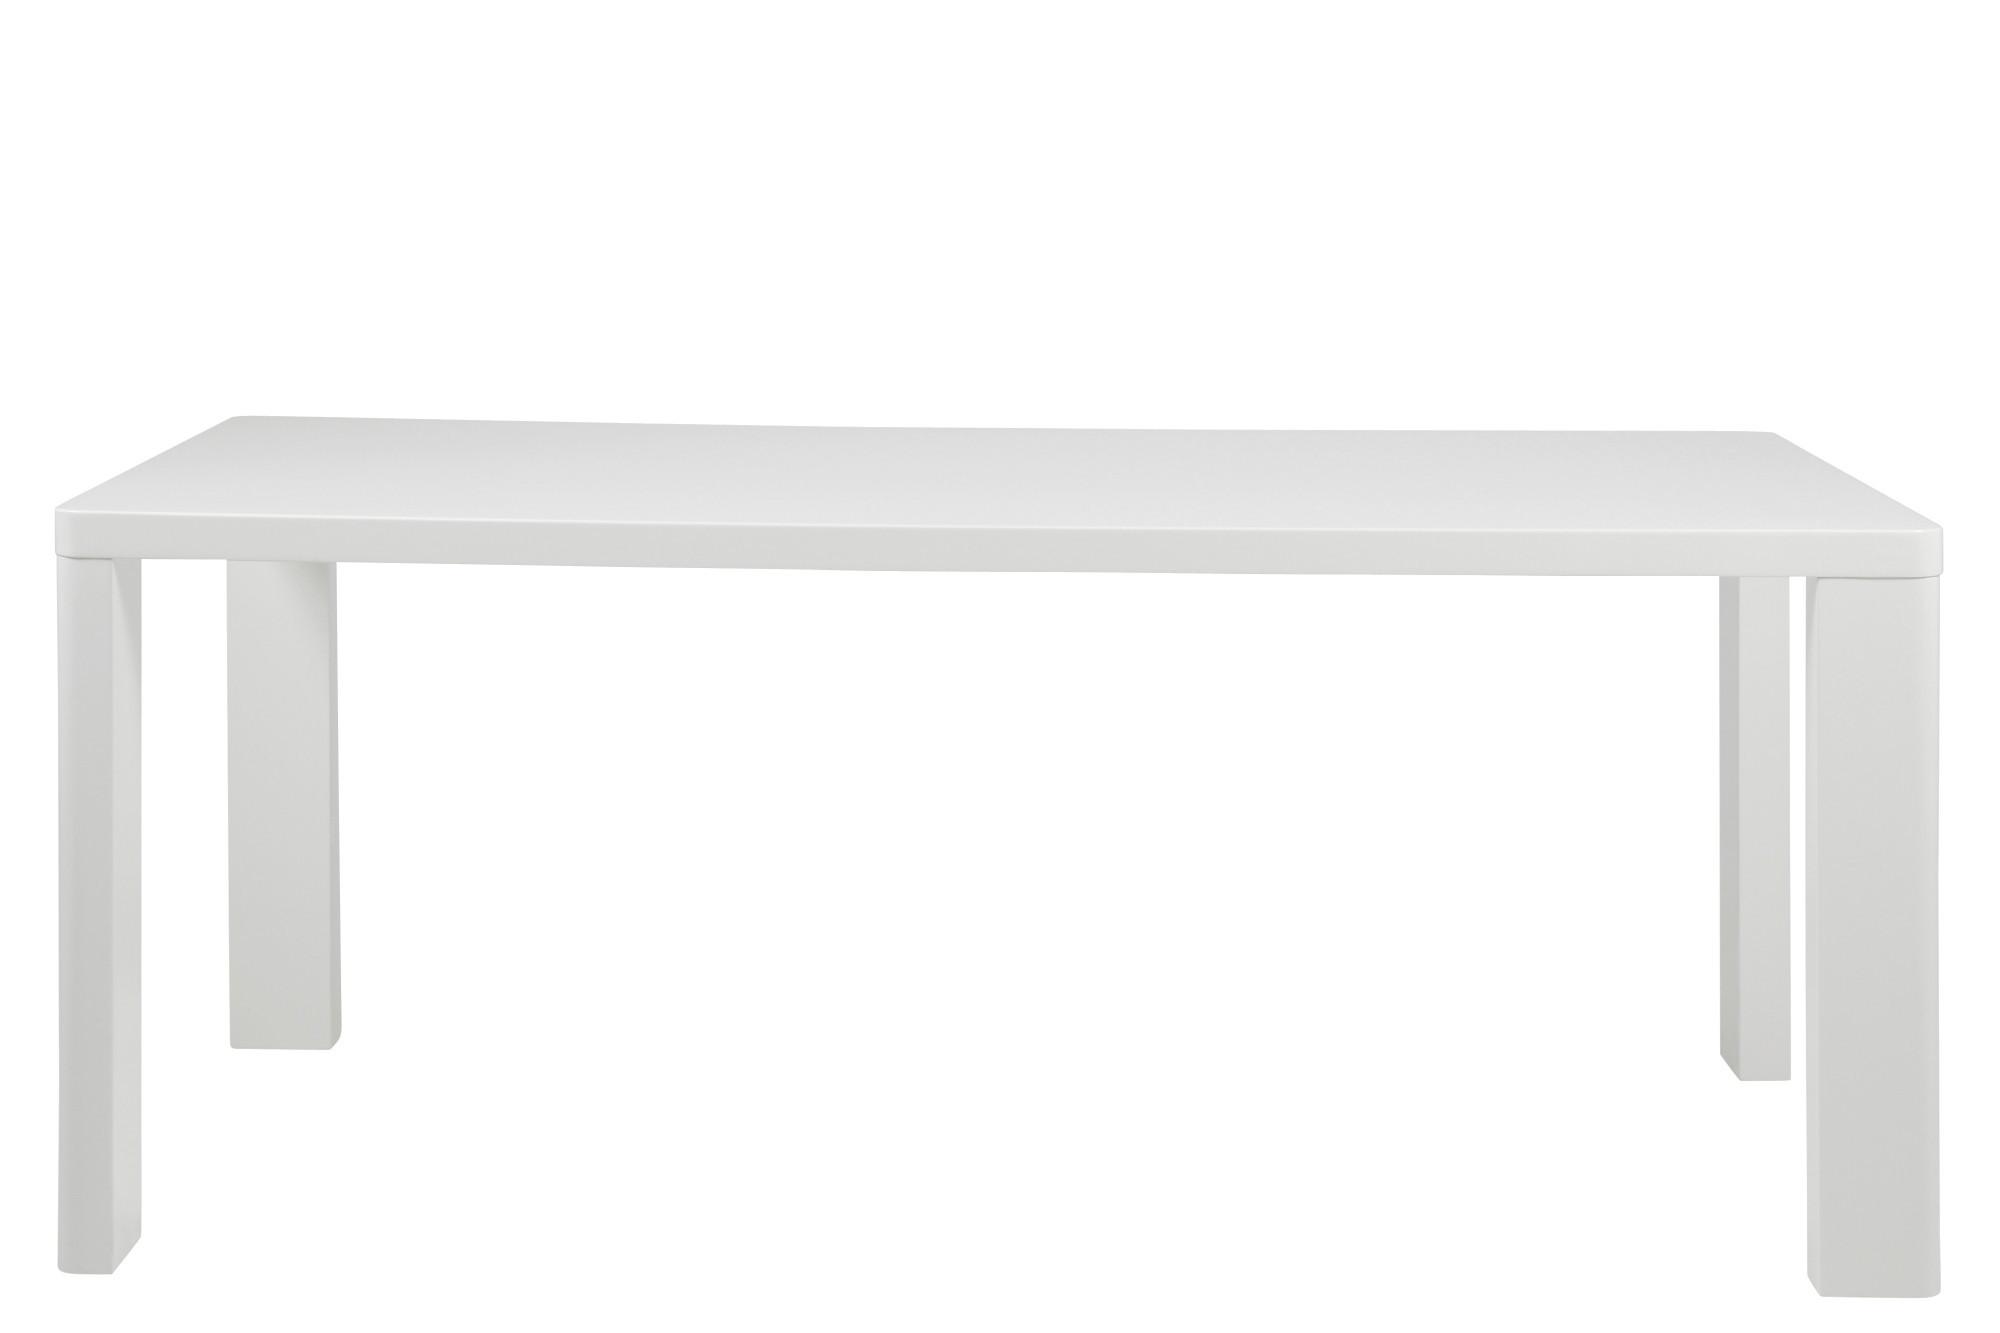 Design Eettafel Wit   Loungeset 2017